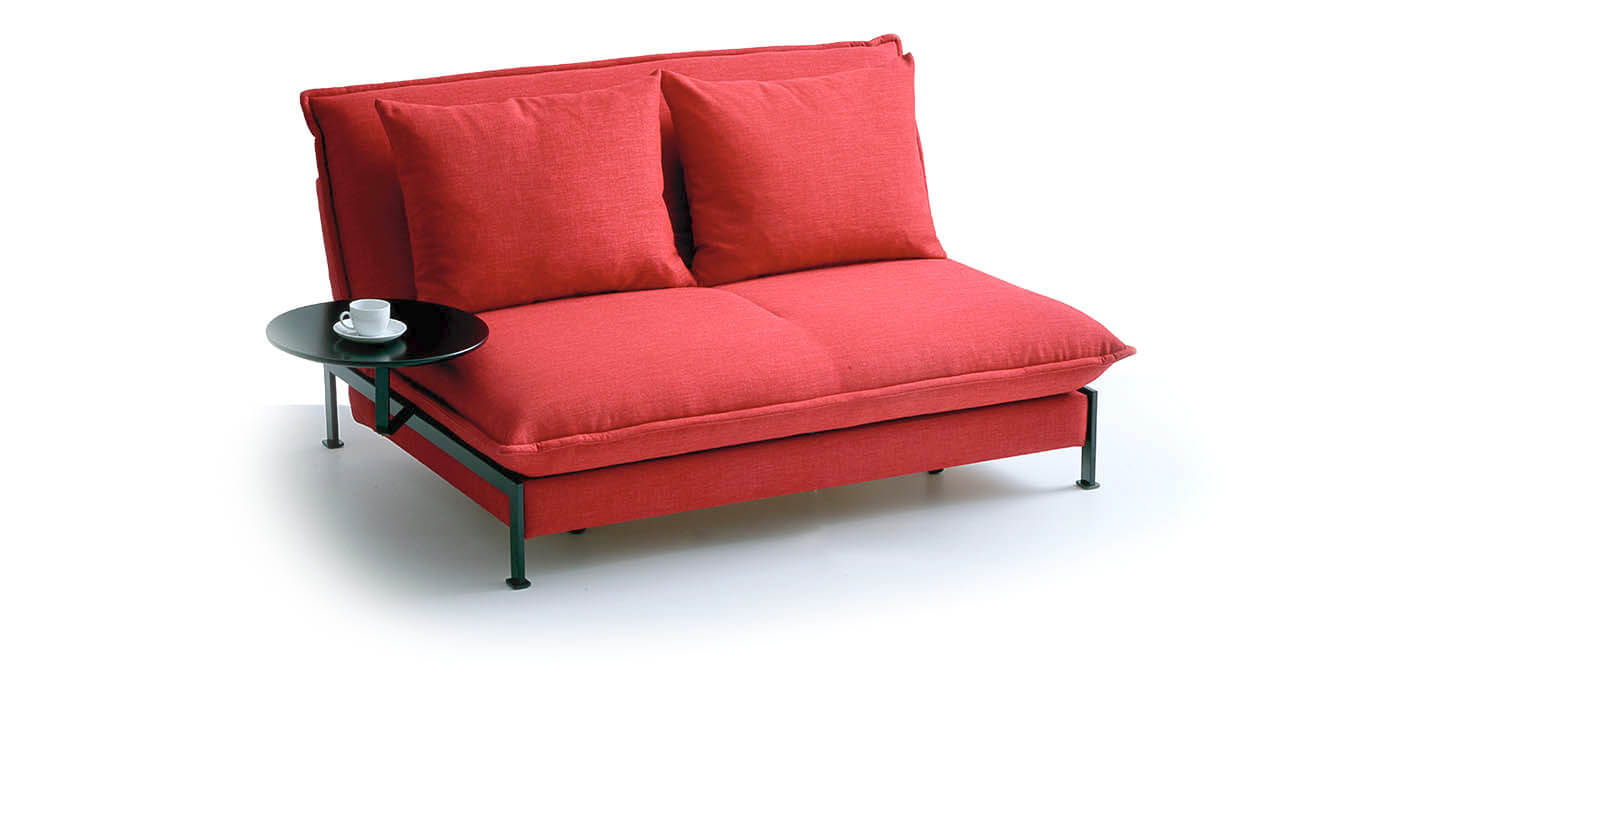 schlafsofa fun von franz fertig. Black Bedroom Furniture Sets. Home Design Ideas